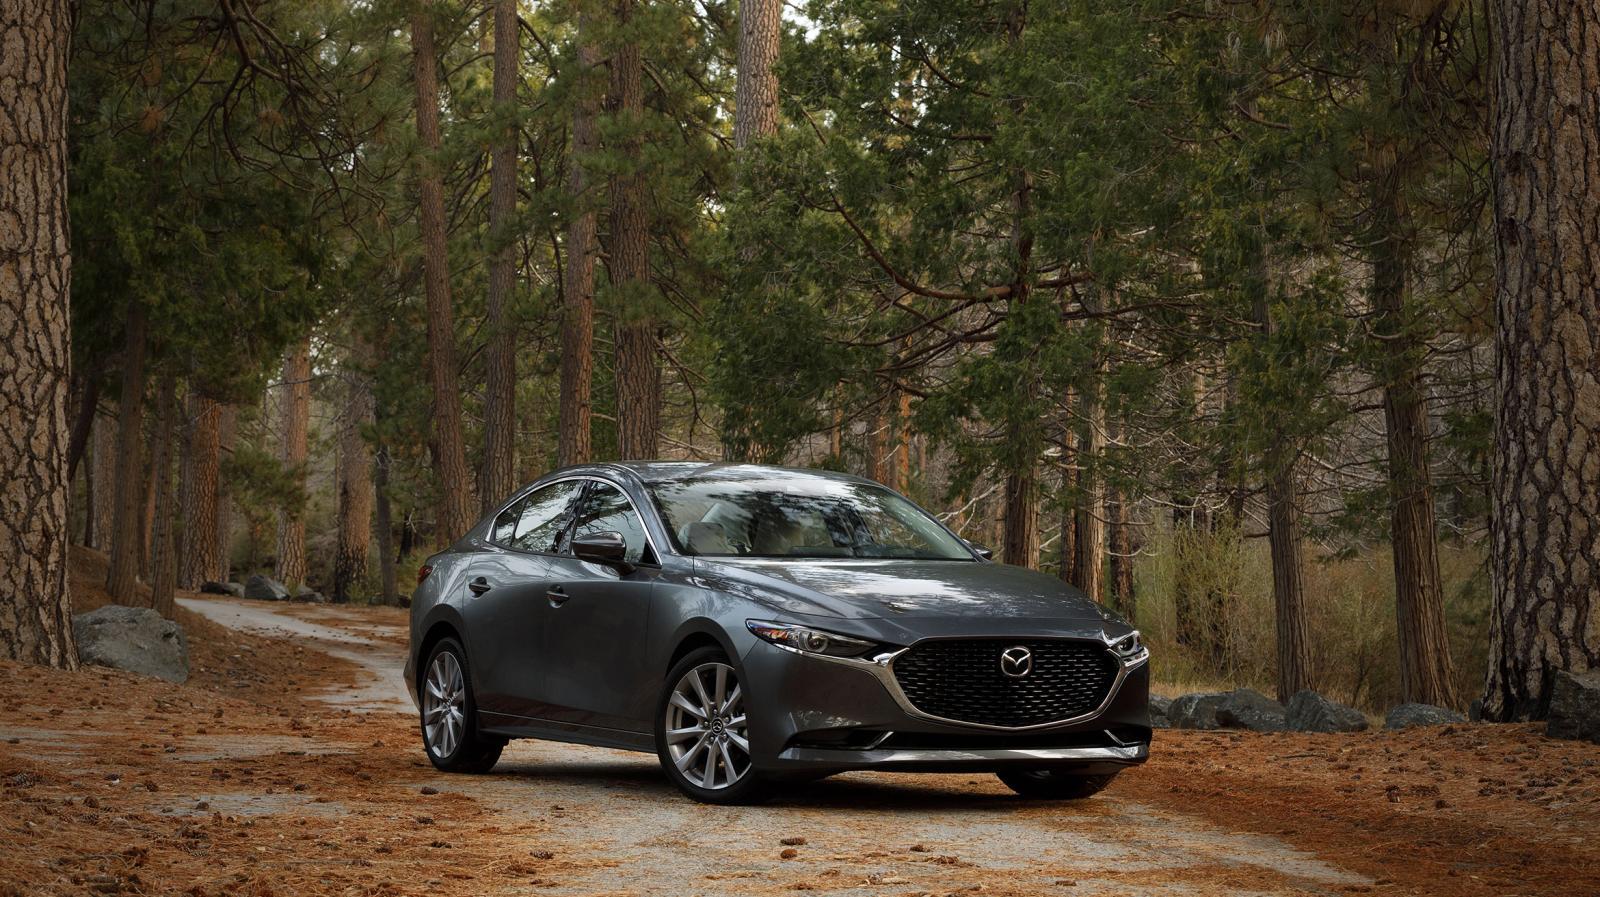 El Mazda 3 Sedan 2020 i Grand Touring proyecta elegancia y vanguardismo